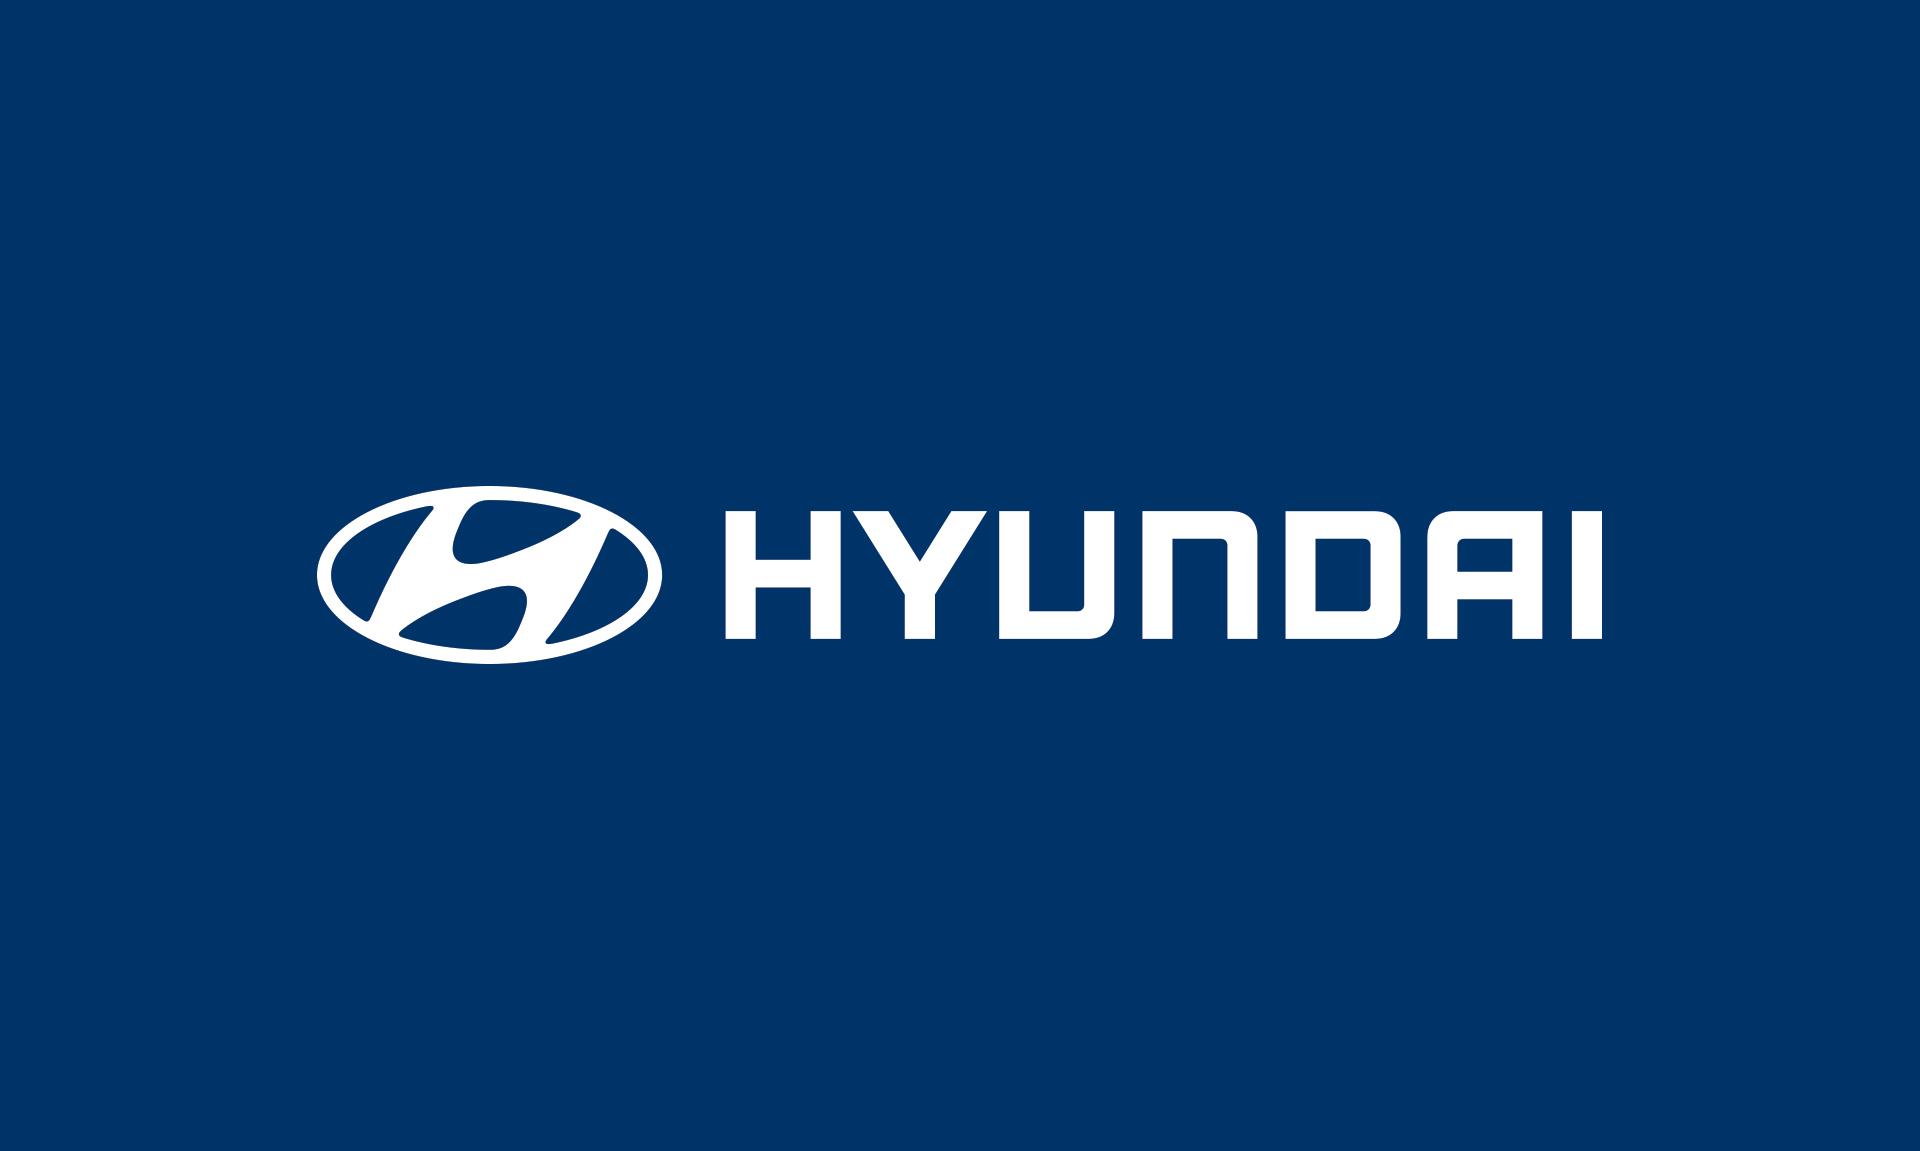 Dee Hyundai Showroom